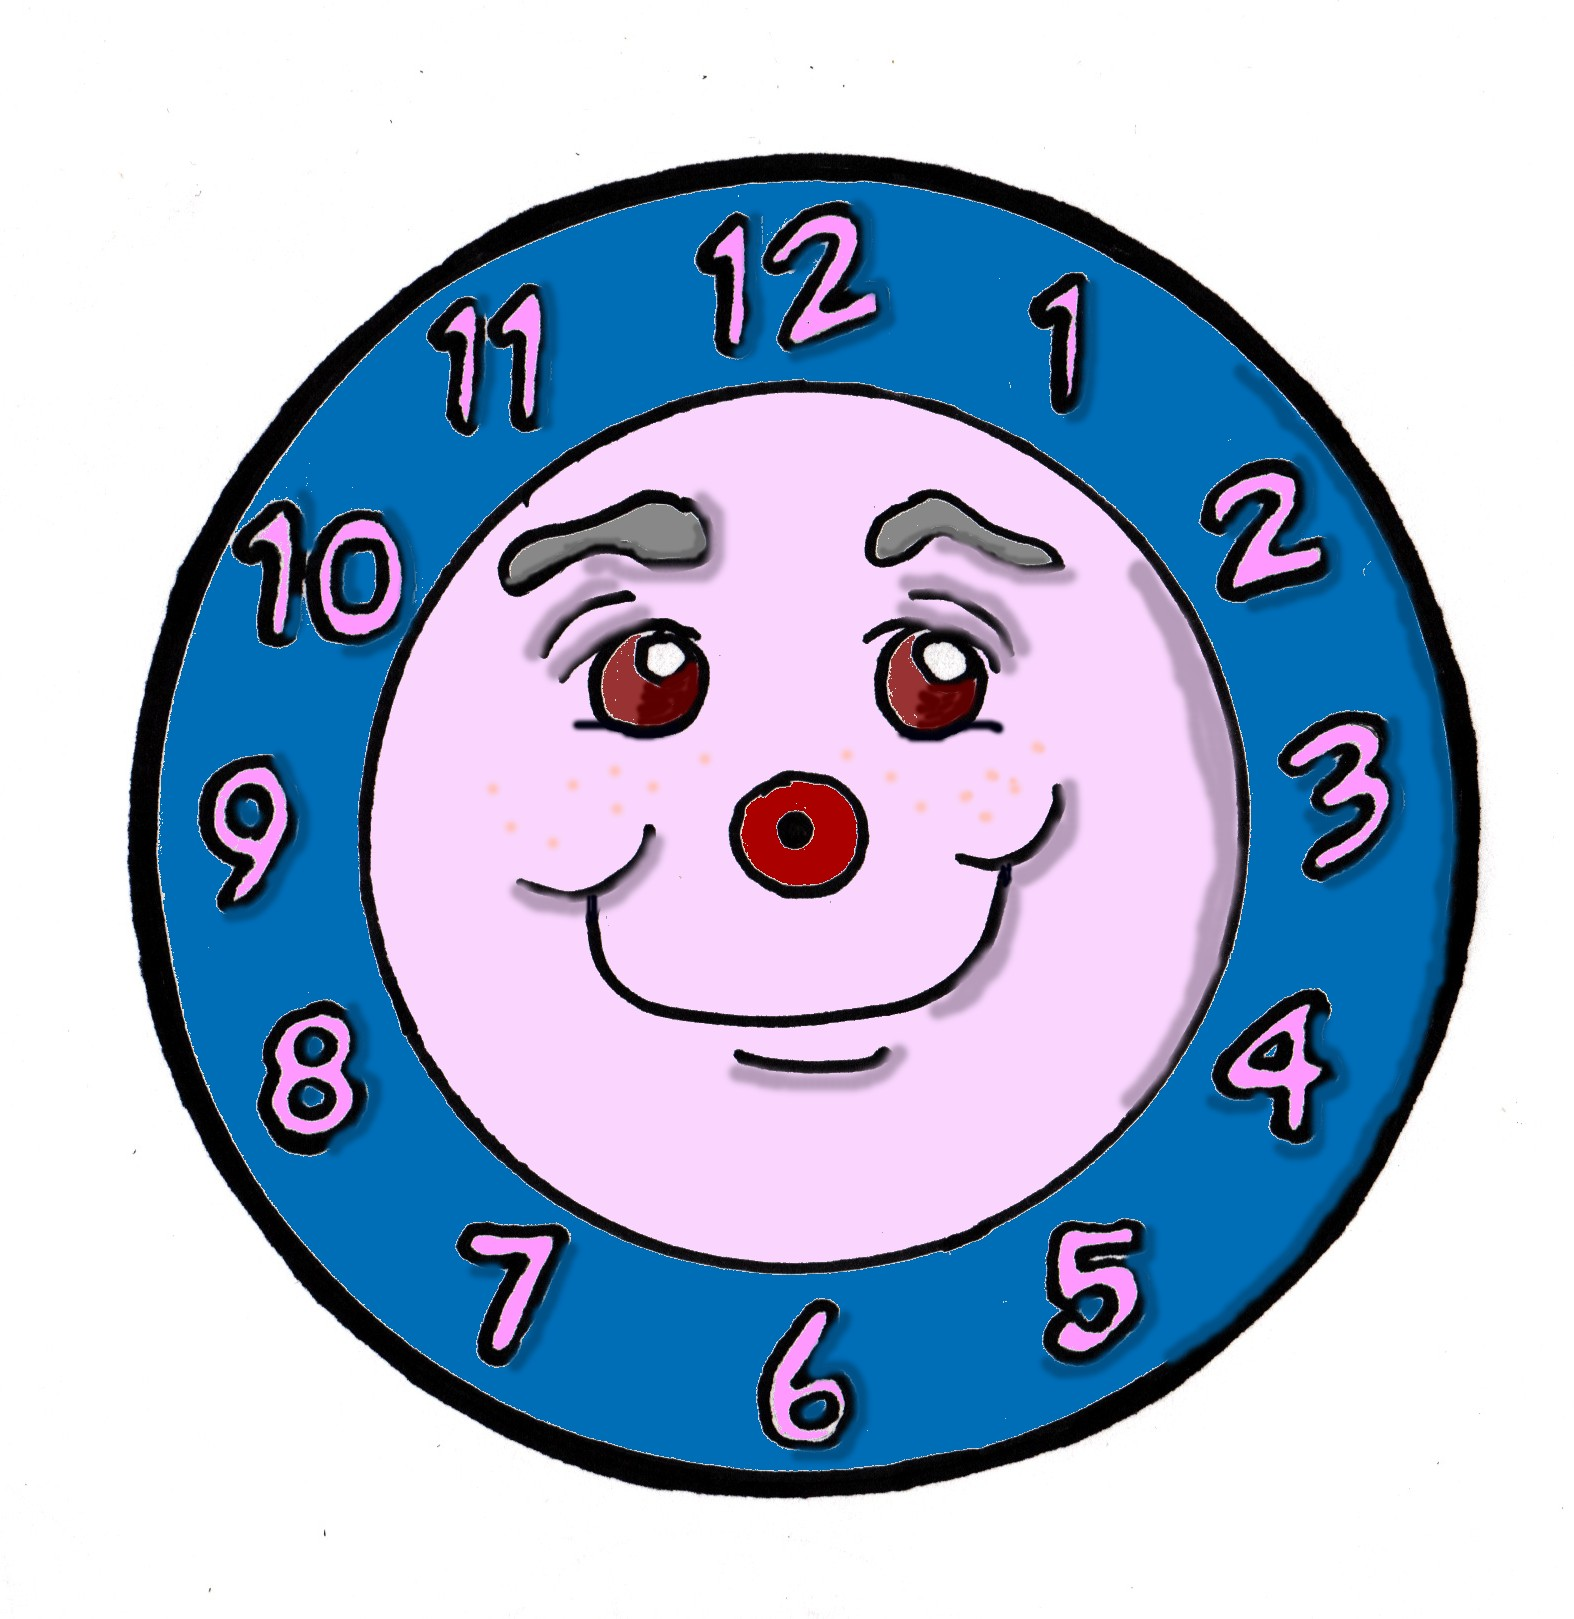 Clock face images clip art.